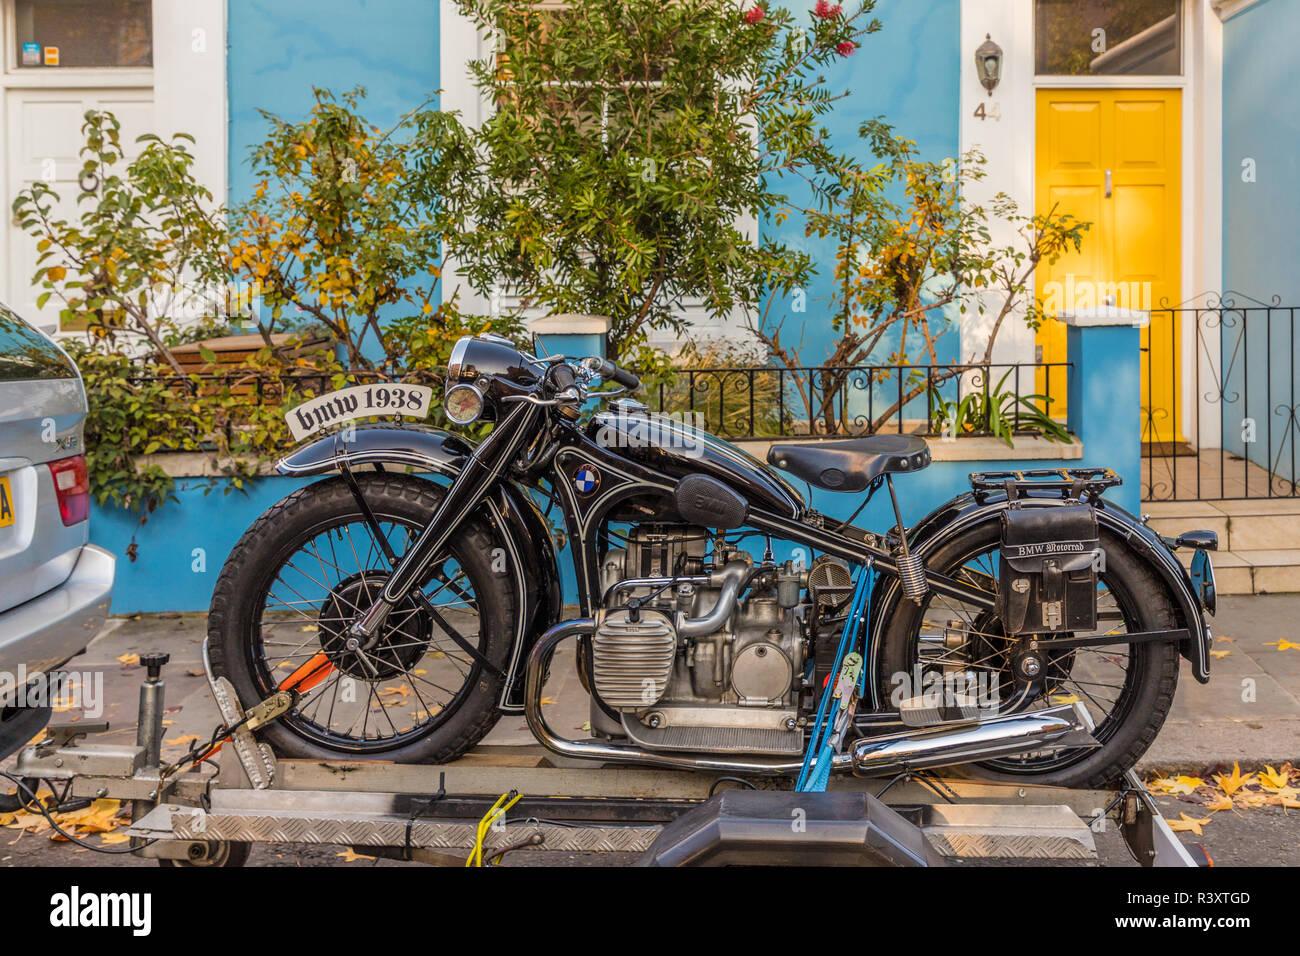 Motorbike Trailer Stock Photos & Motorbike Trailer Stock